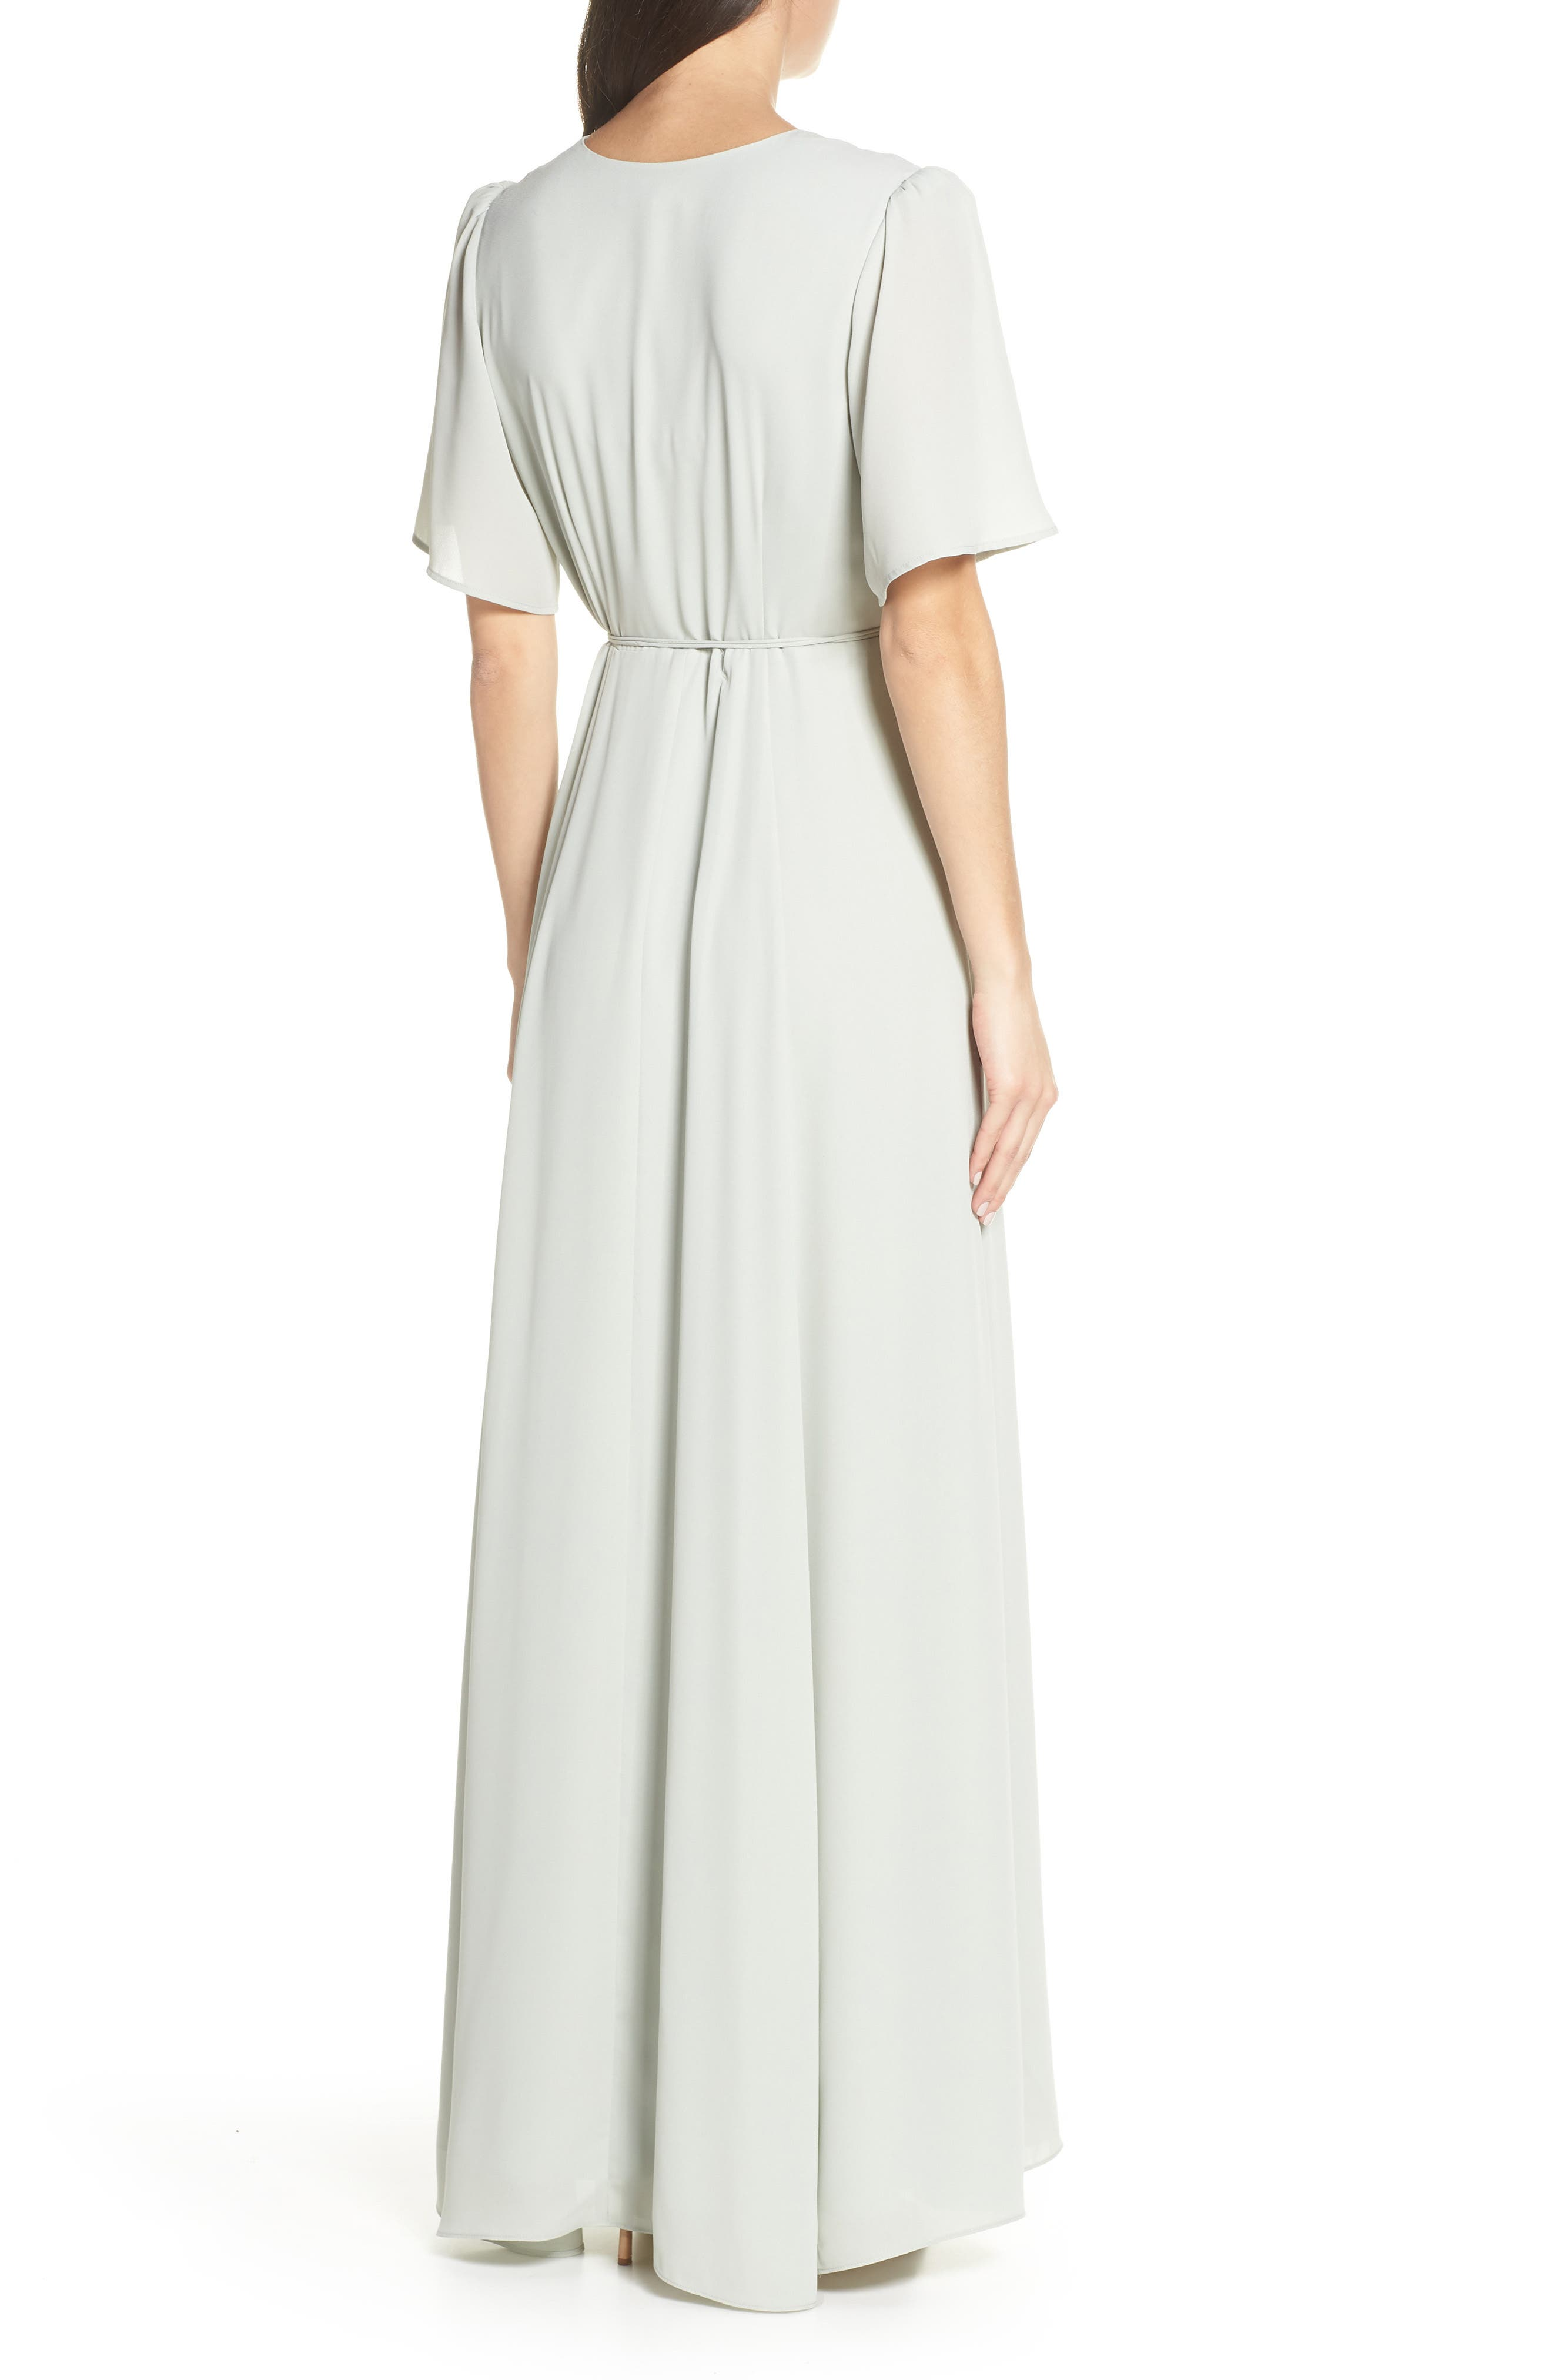 WAYF,                             The Aurelia Short Sleeve Wrap Evening Dress,                             Alternate thumbnail 2, color,                             SAGE